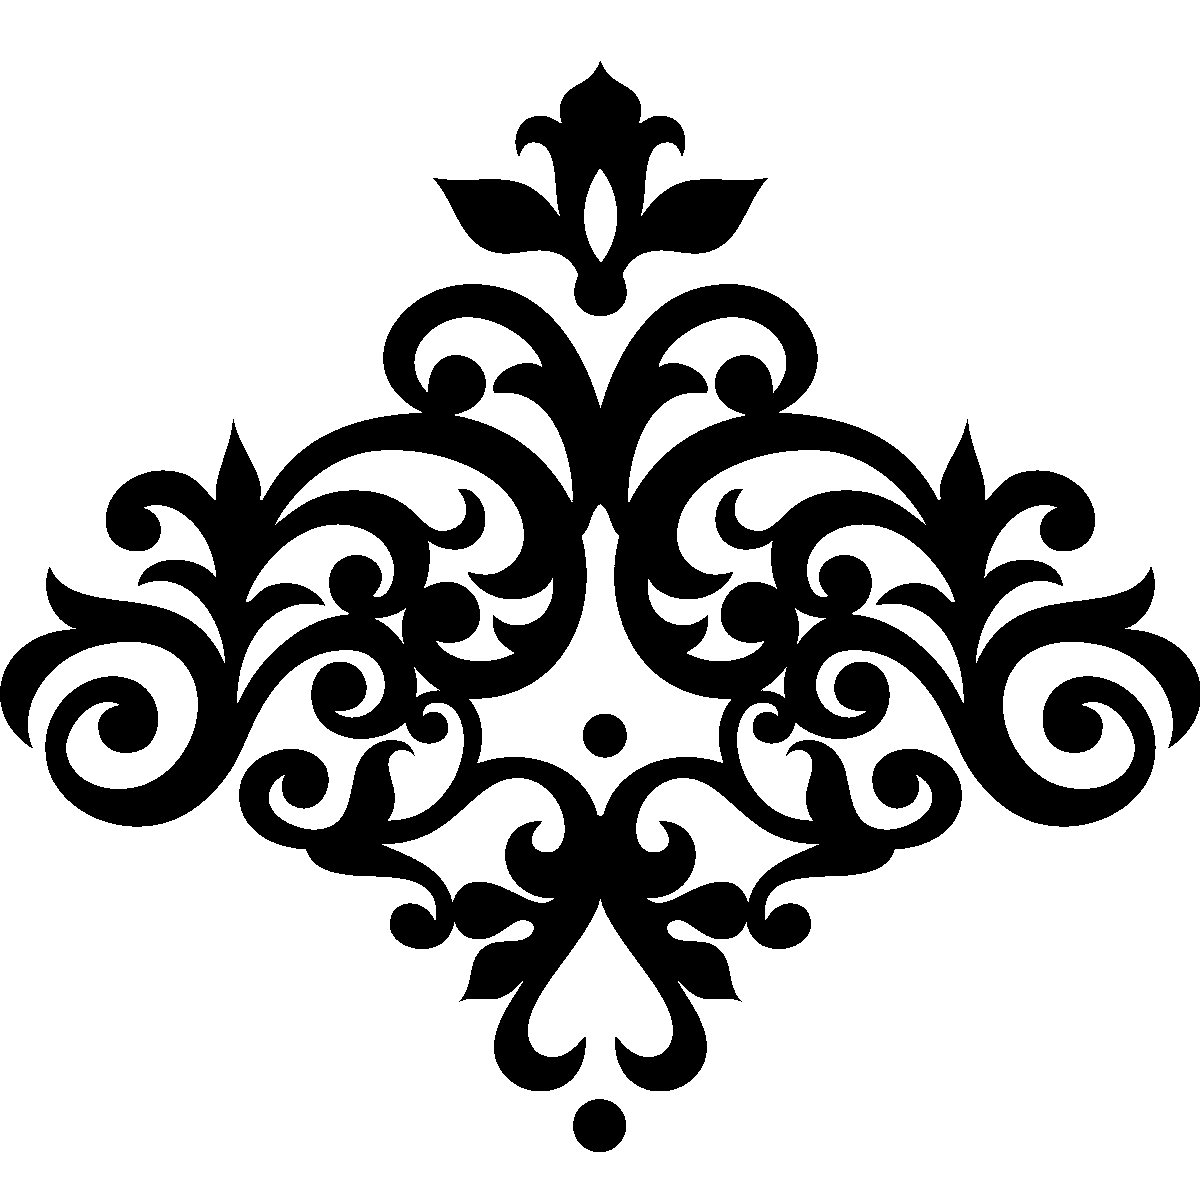 Muurstickers design muursticker barok bloem ambiance - Deco kamer stijl engels ...